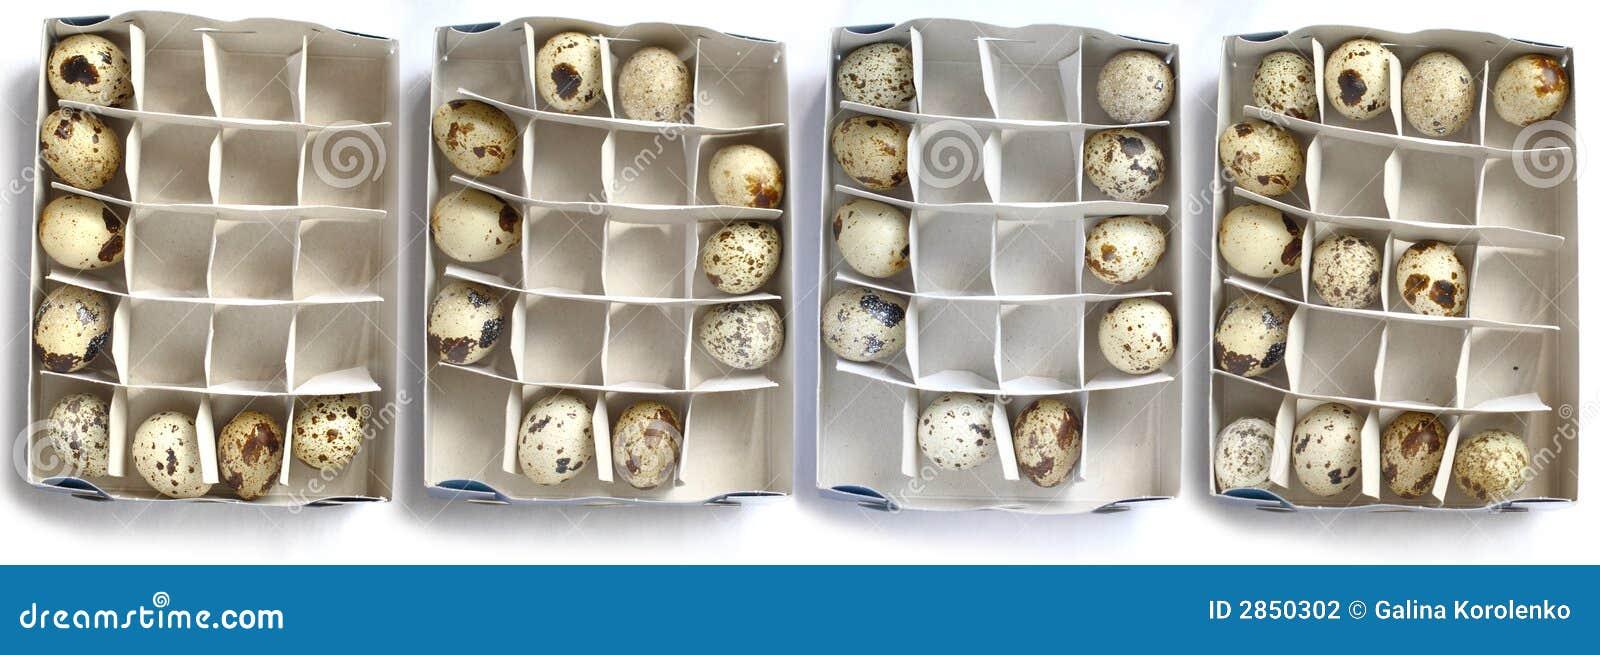 Liefde en eieren